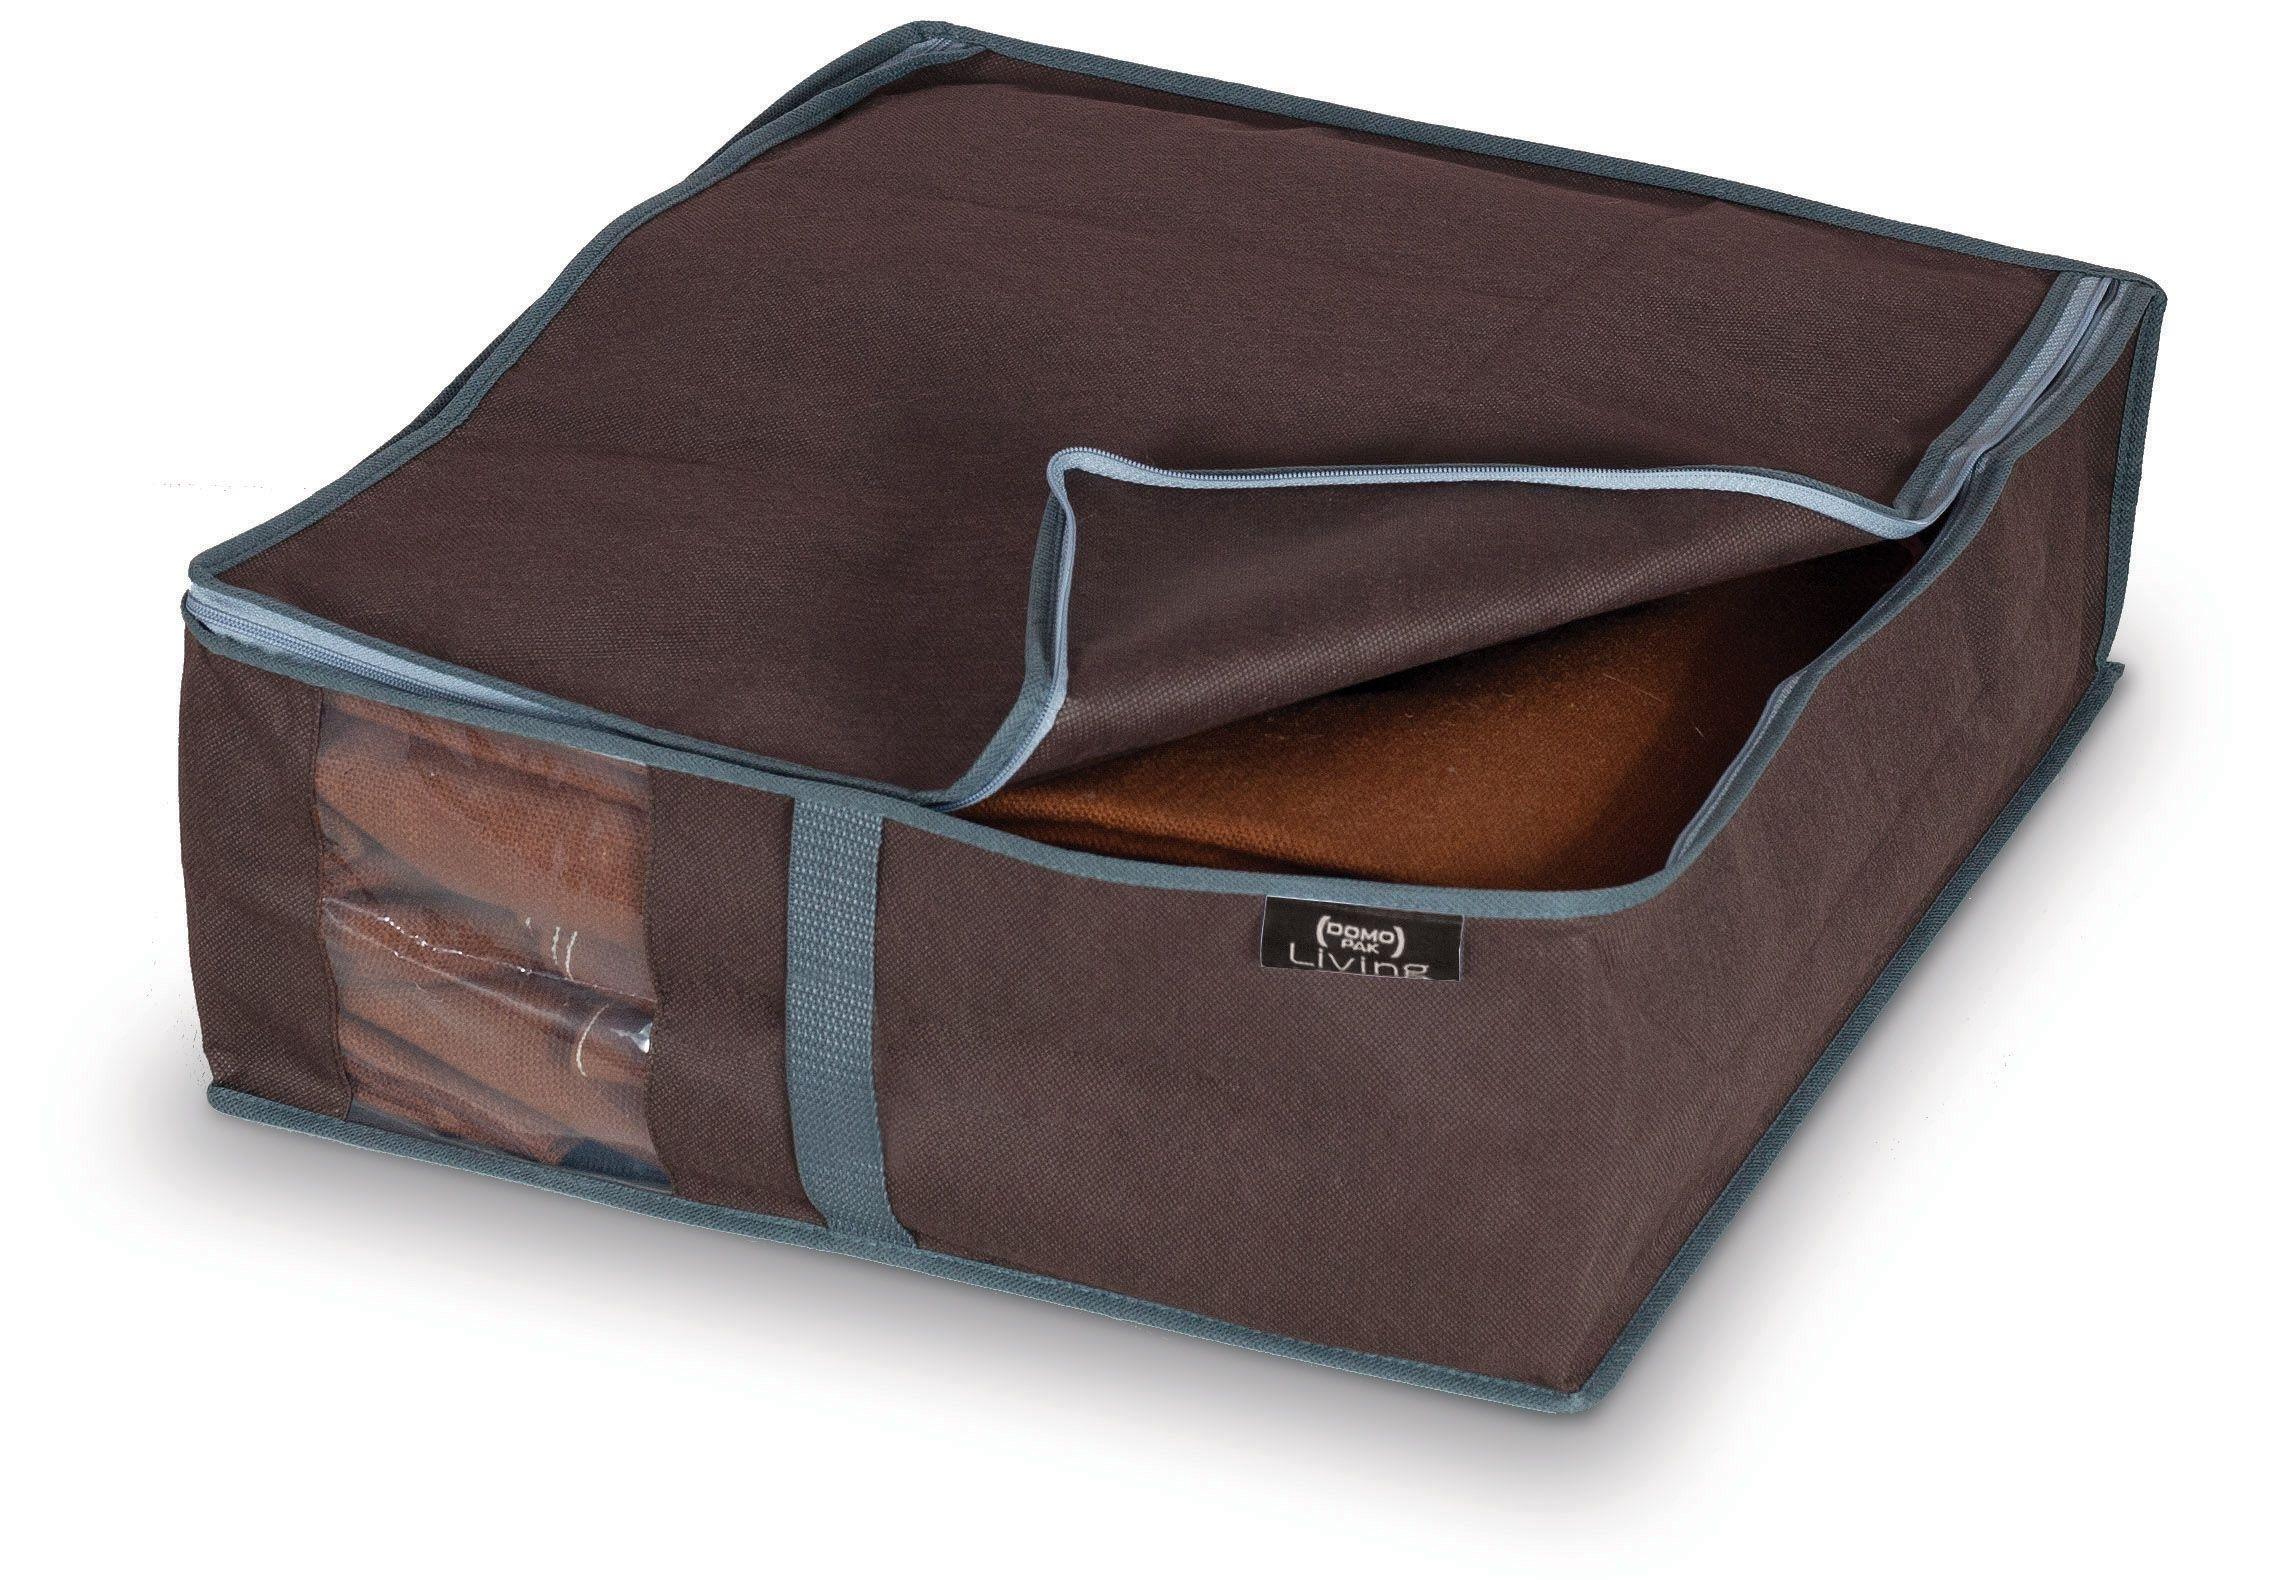 Organizator textil pliabil cu fermoar, Classic Maro, L45xl40xH15 cm imagine